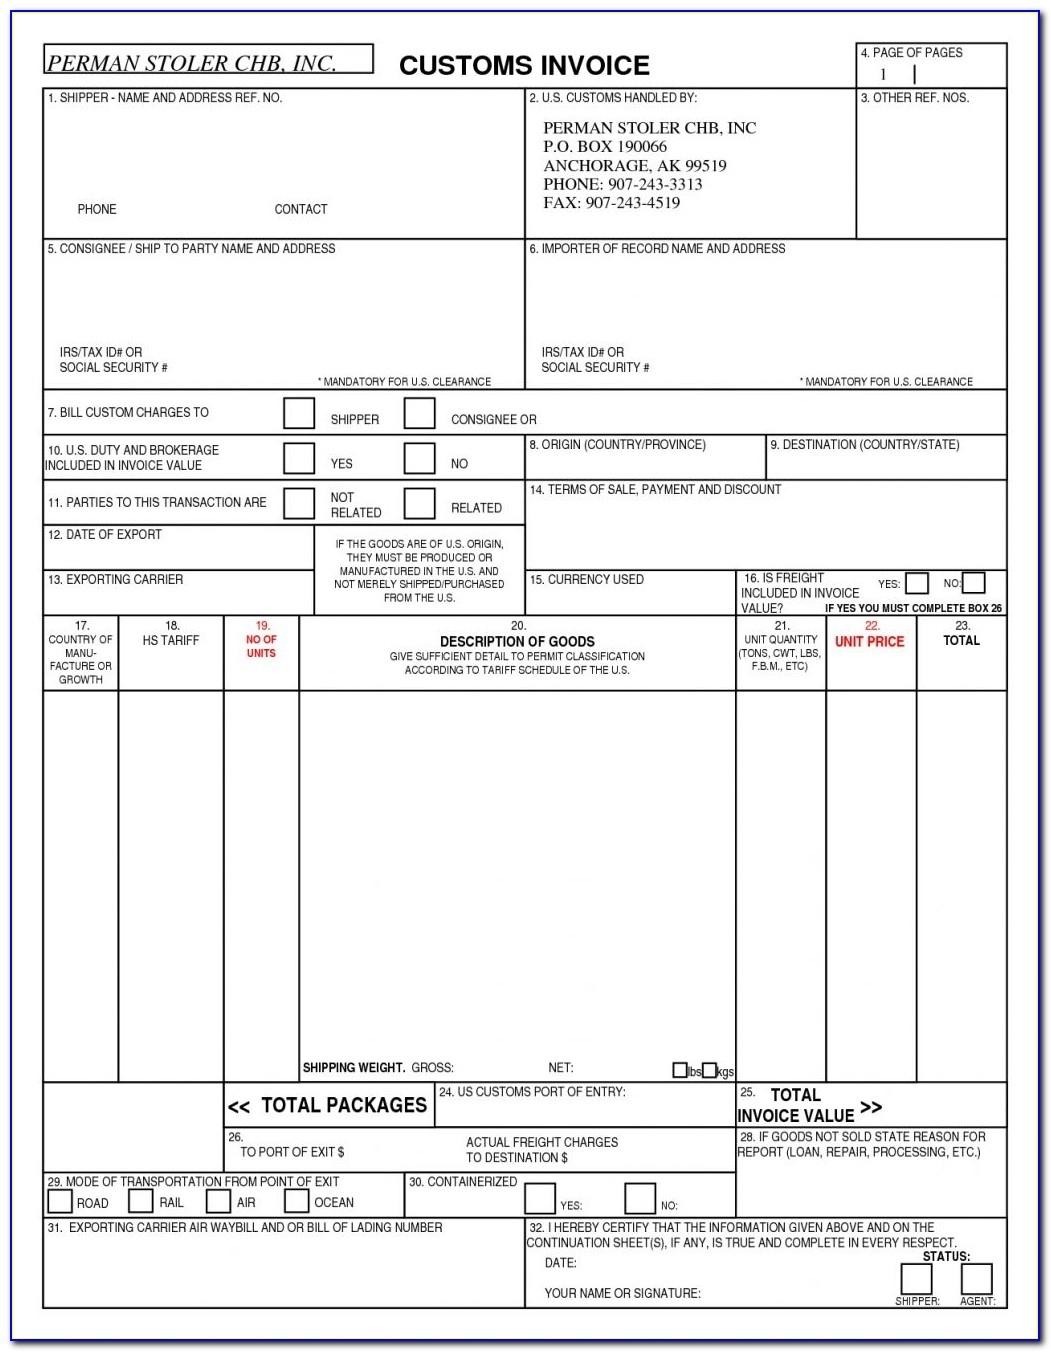 customs invoice template invoicegenerator us customs invoice us customs invoice fillable